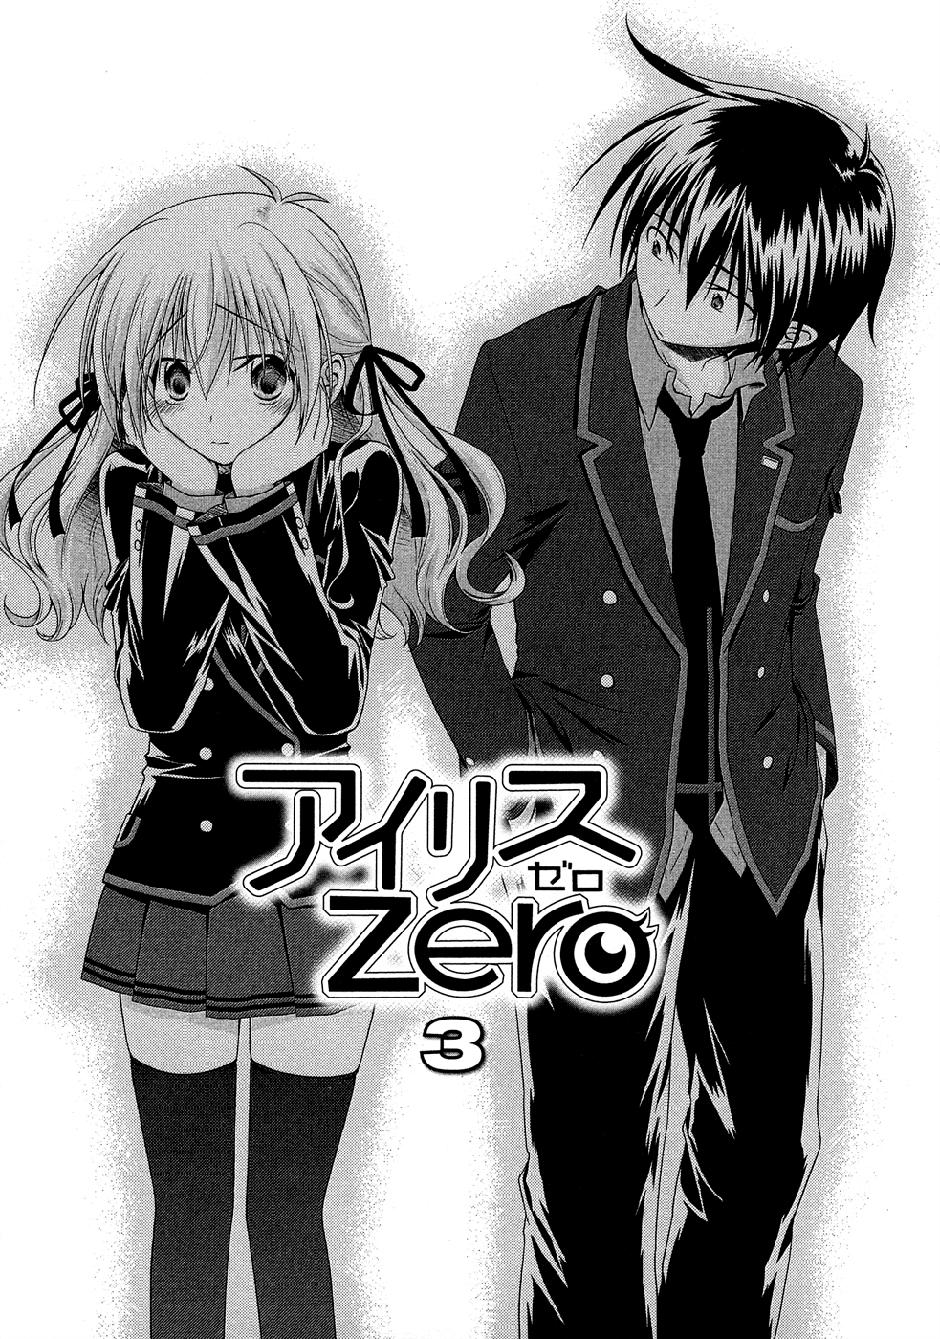 Komik iris zero 0010 11 Indonesia iris zero 0010 Terbaru 4|Baca Manga Komik Indonesia|